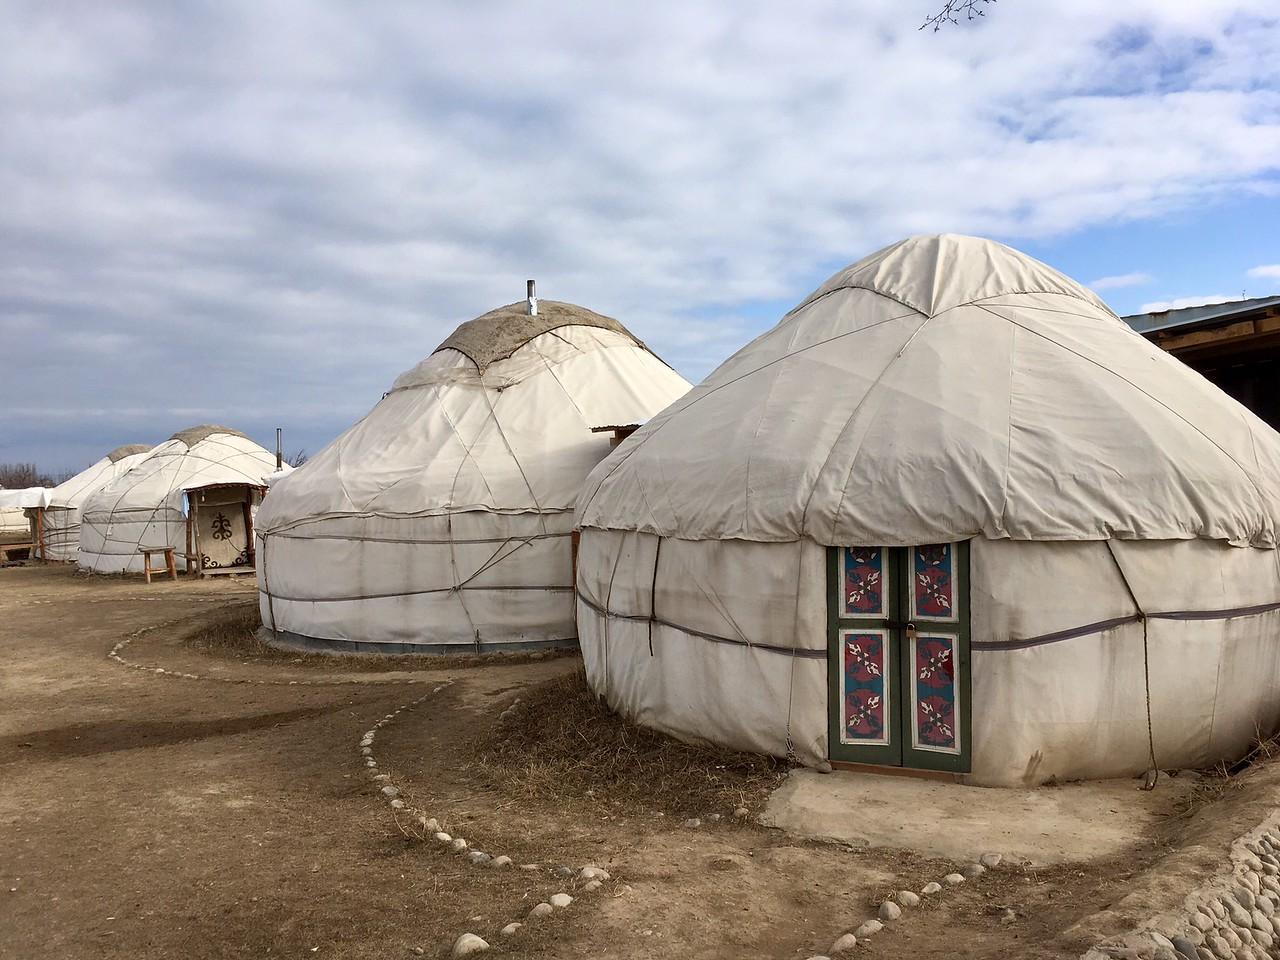 Almaluu Yurt Camp - Southern Shore Issyk-Kul, Kyrgyzstan